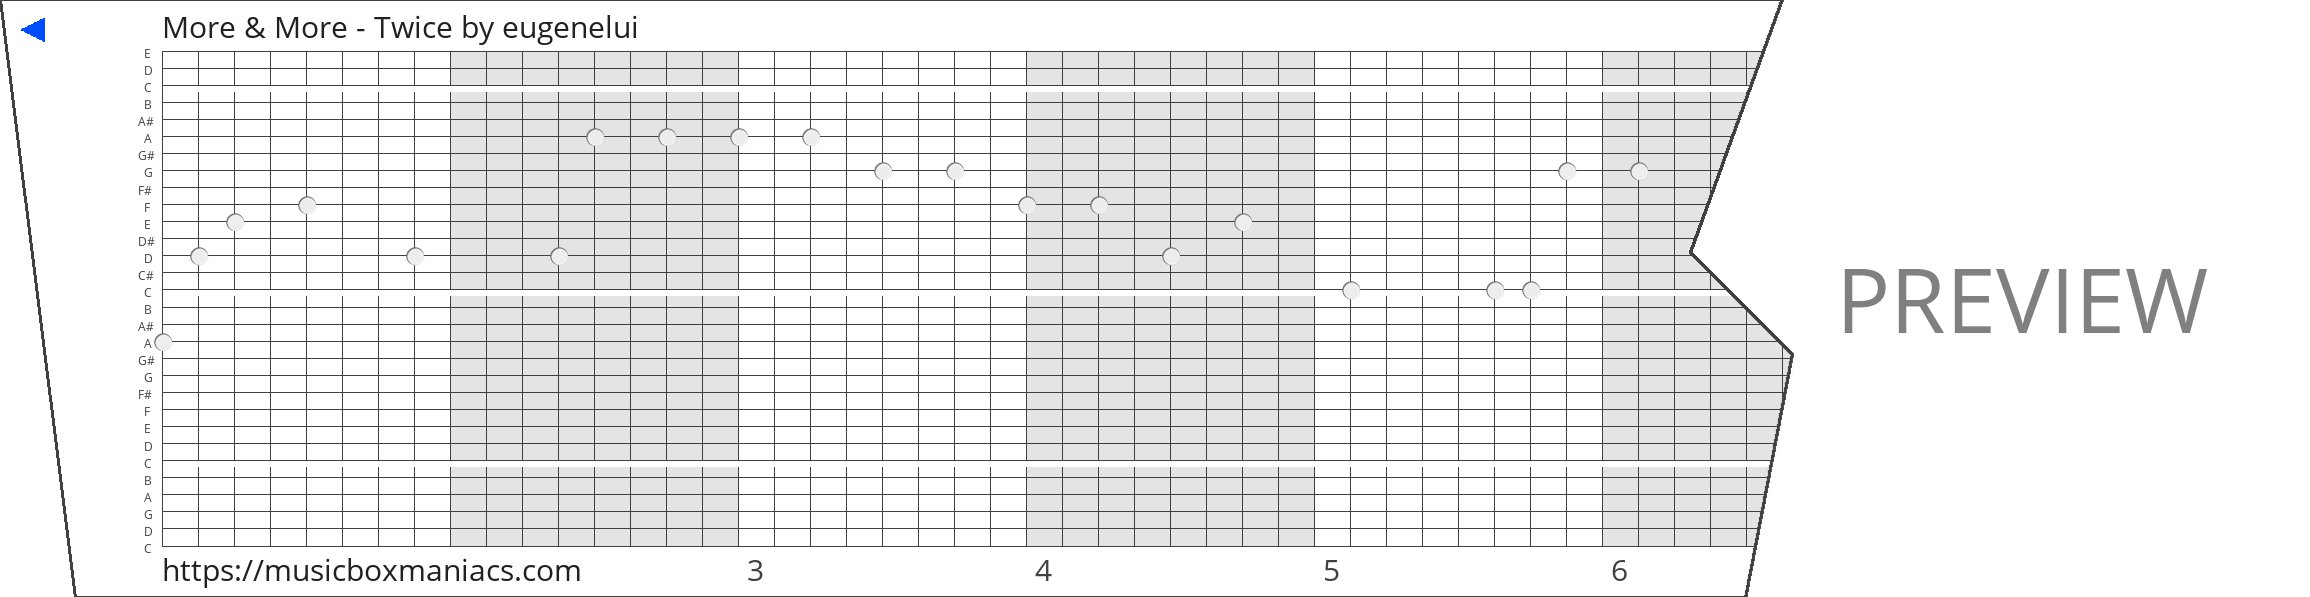 More & More - Twice 30 note music box paper strip